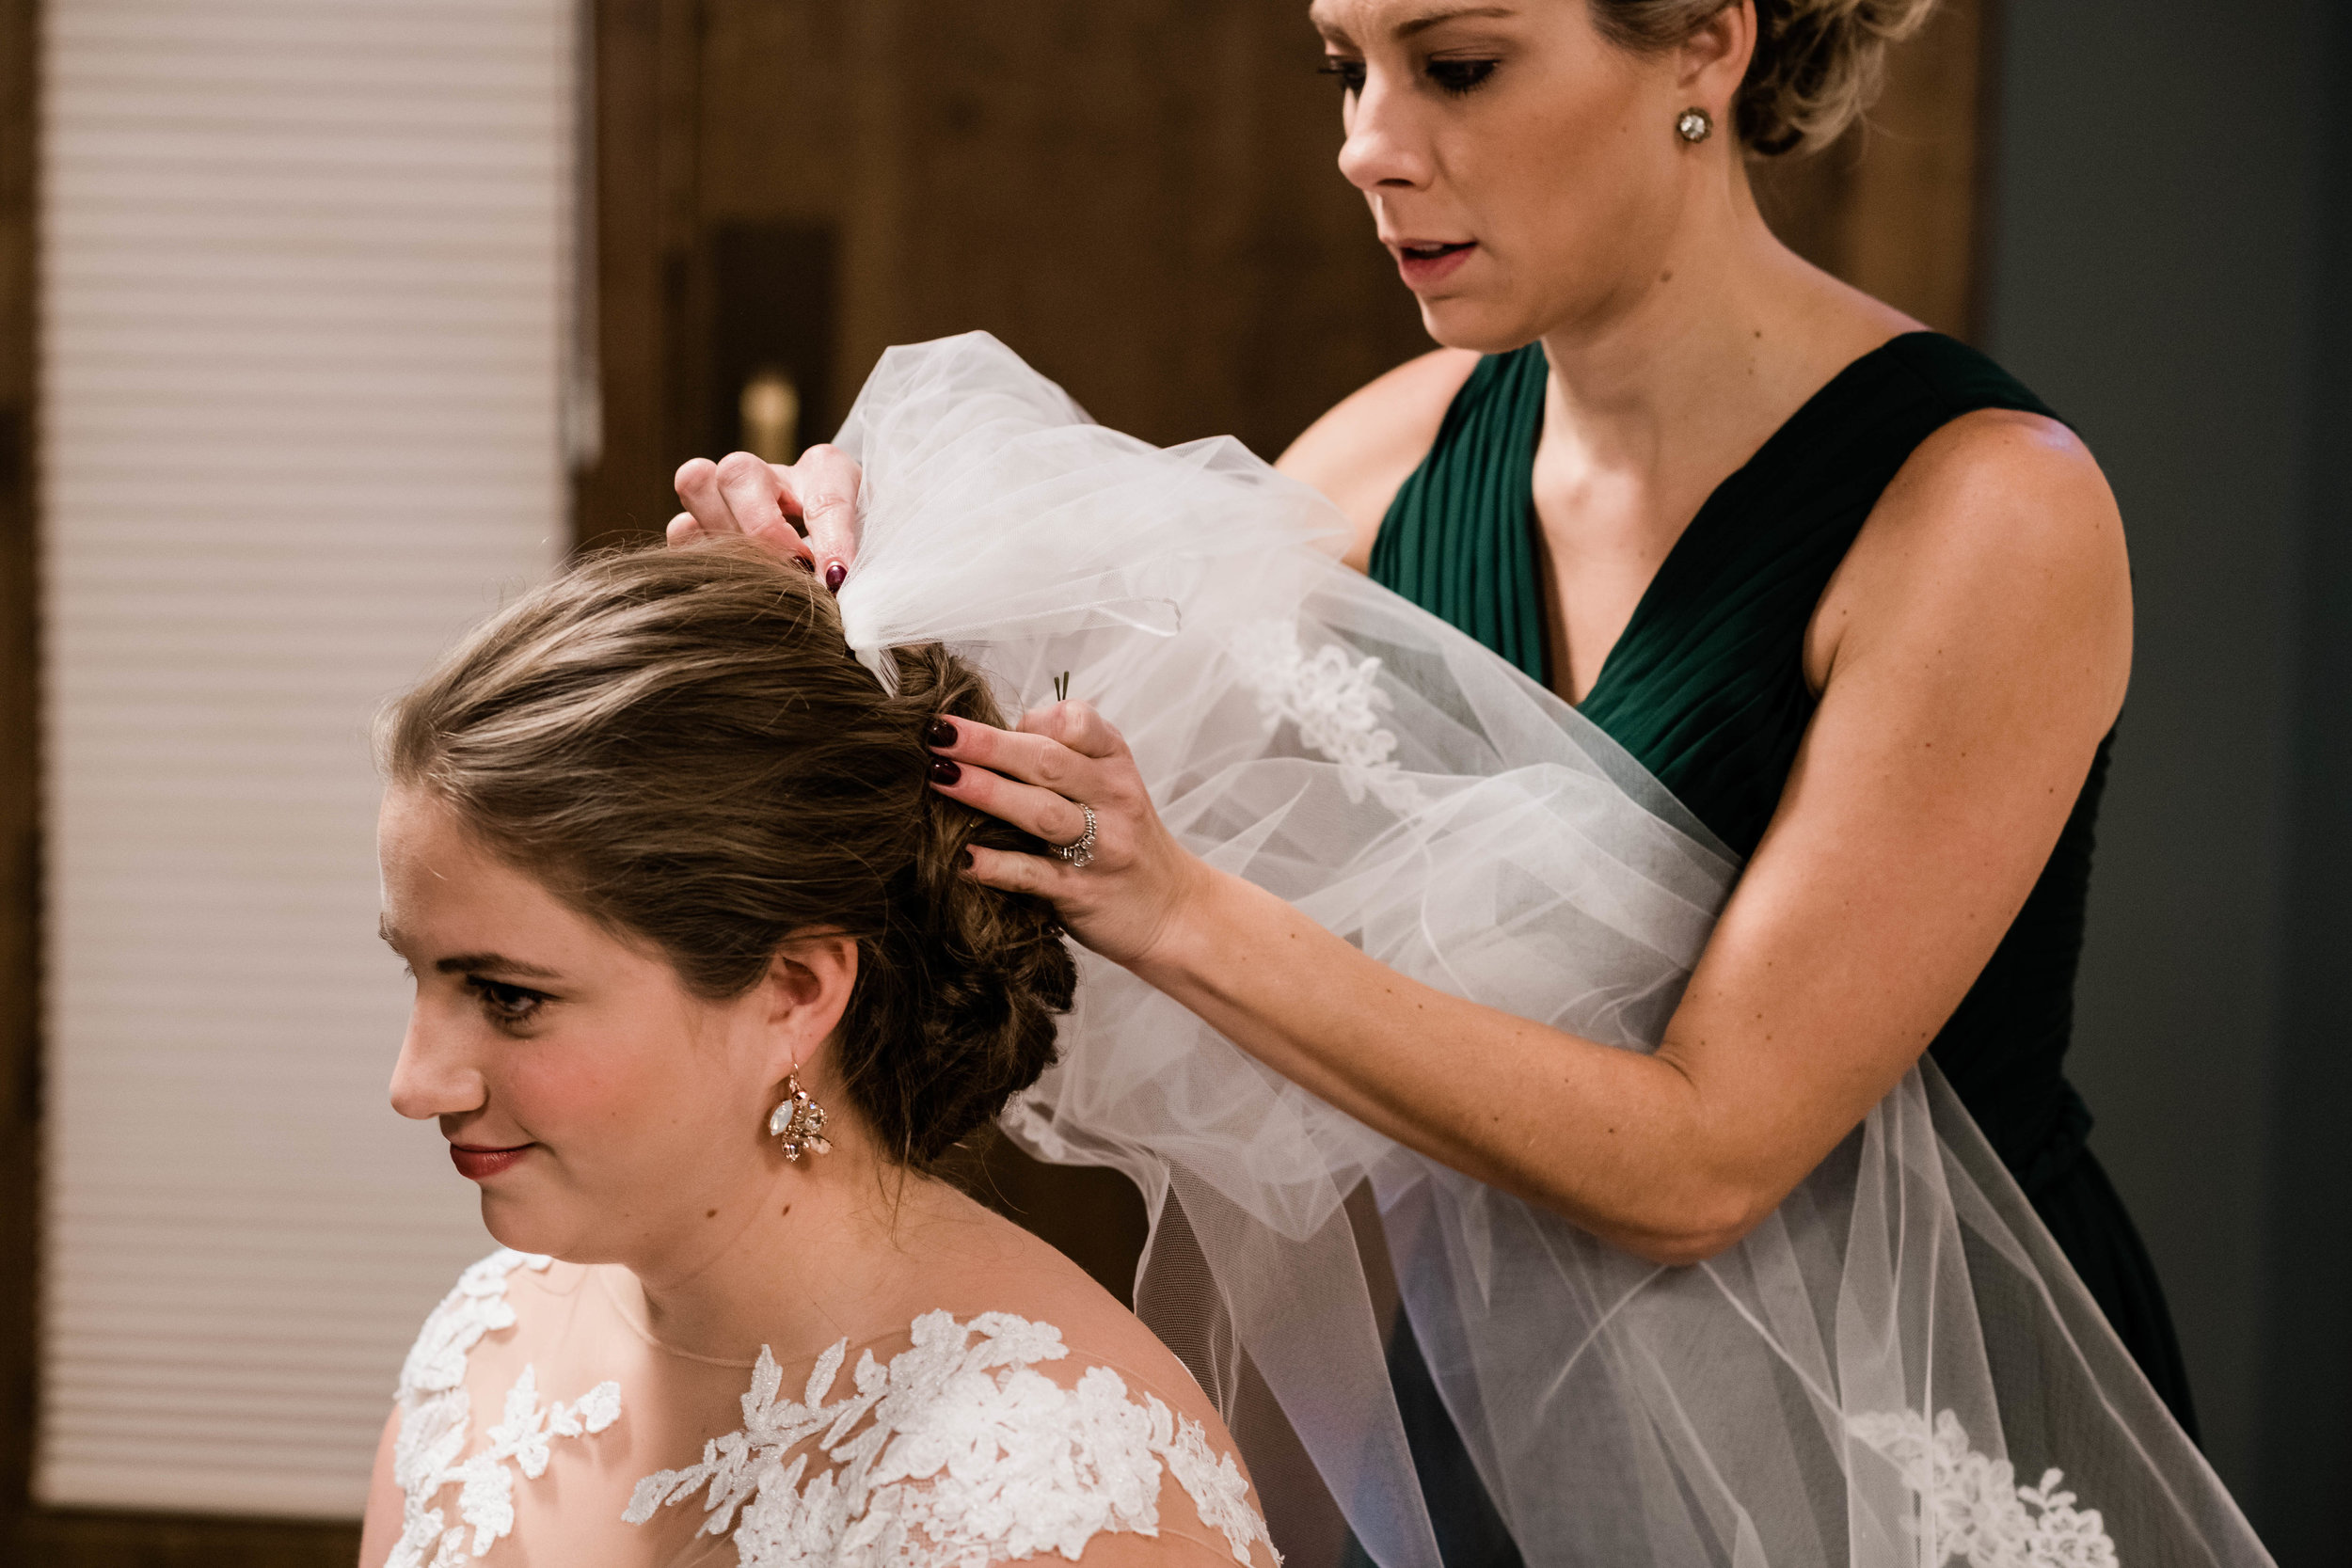 Bridesmaid putting bride's veil on